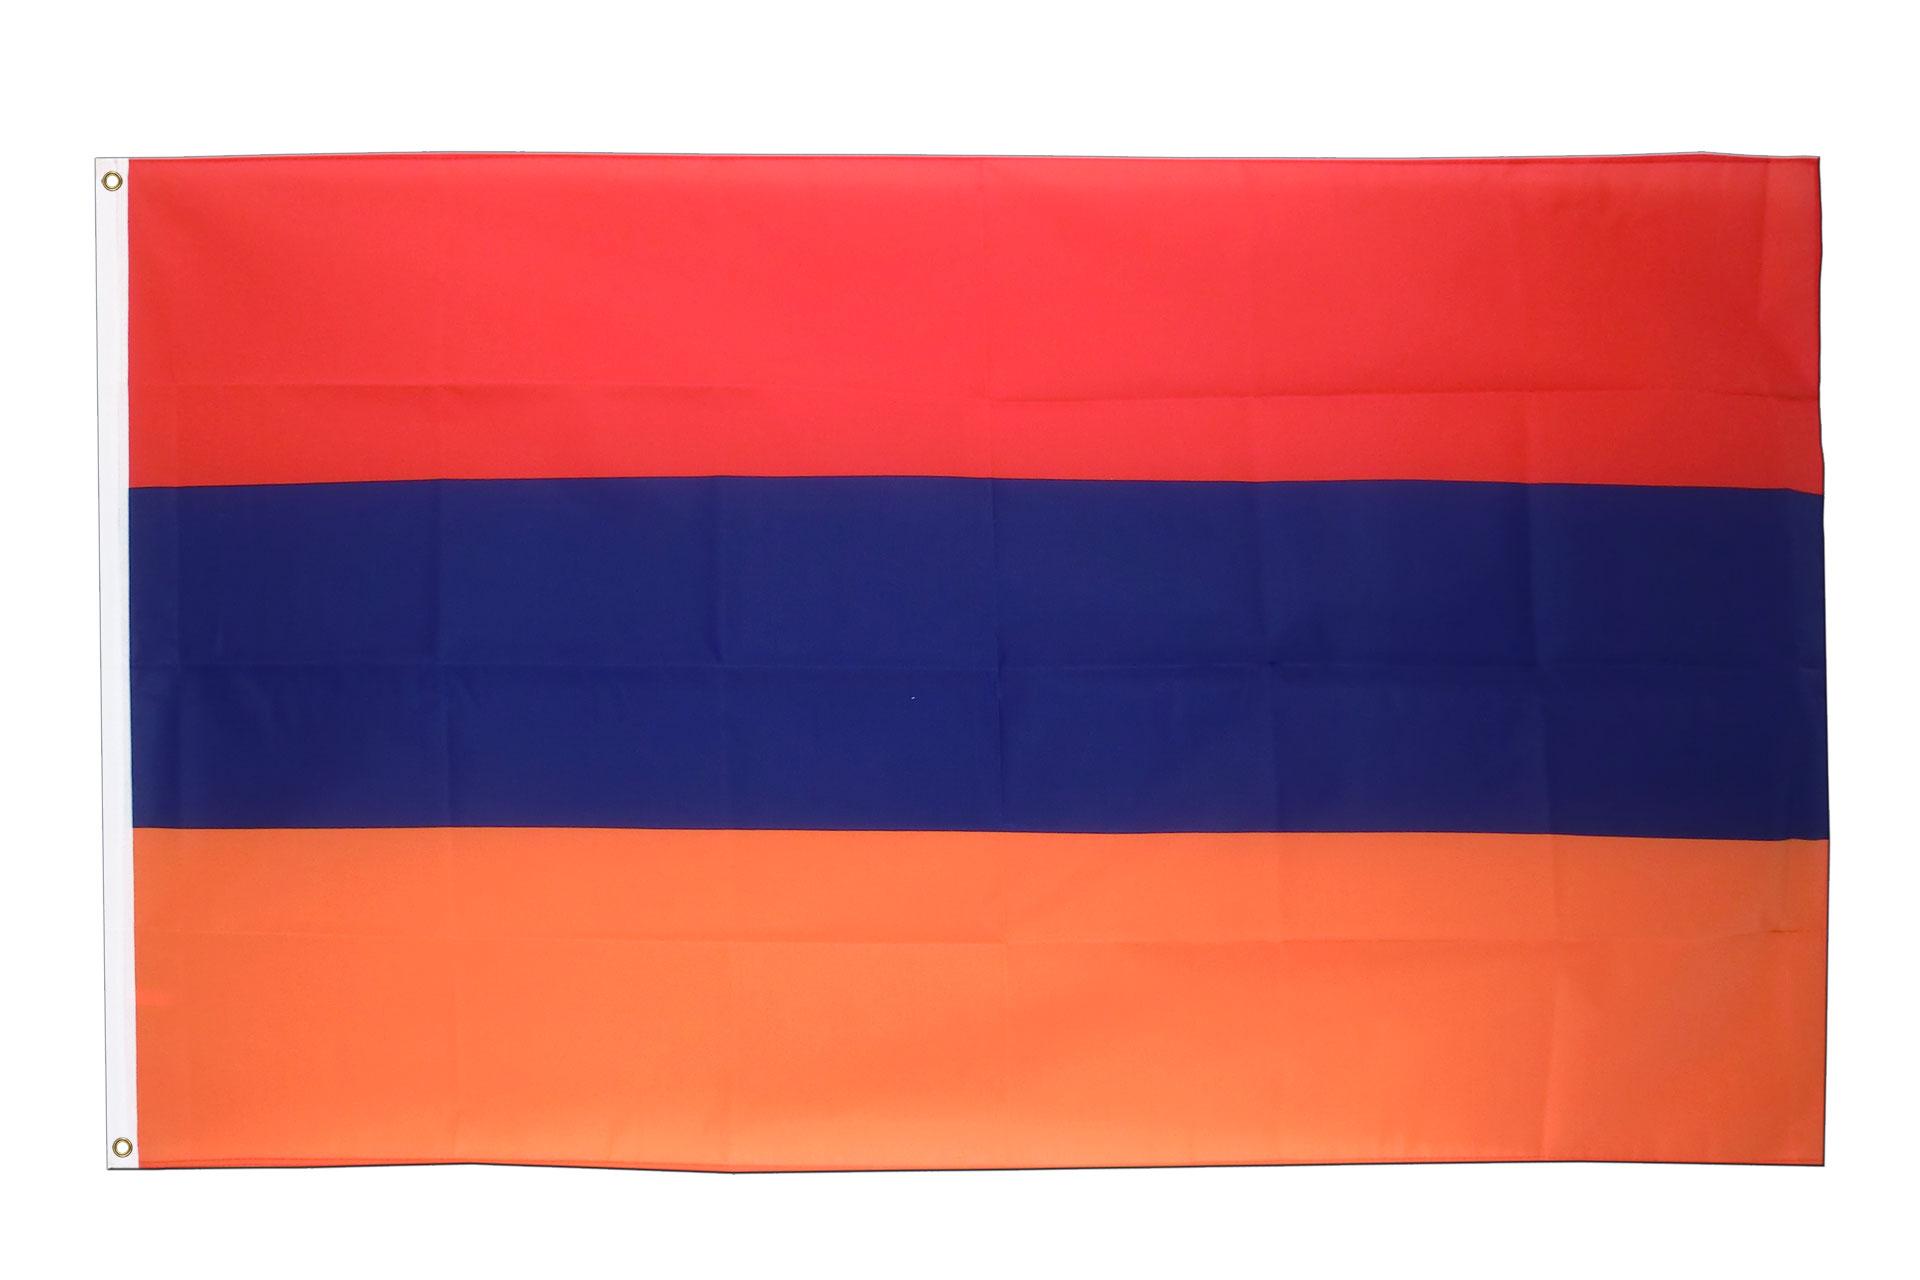 Buy Armenia Flag - 3x5 ft (90x150 cm) - Royal-Flags: royal-flags.co.uk/armenia-flag-1531.html